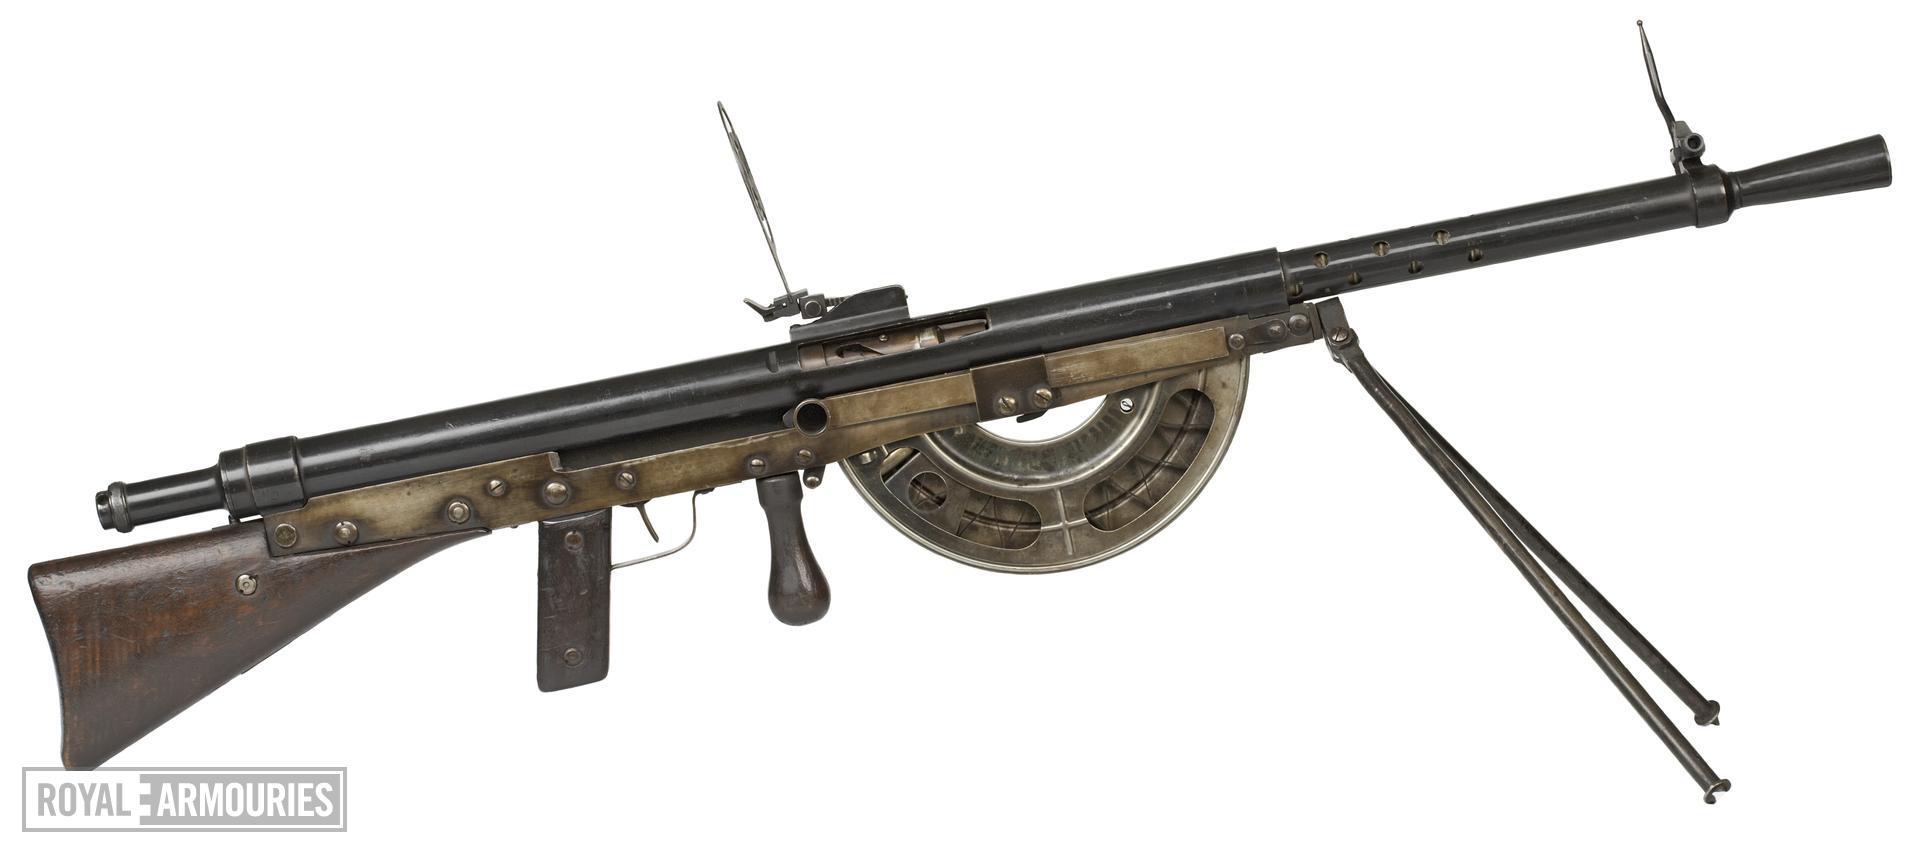 Centrefire automatic light machine gun - Chauchat Model 1915